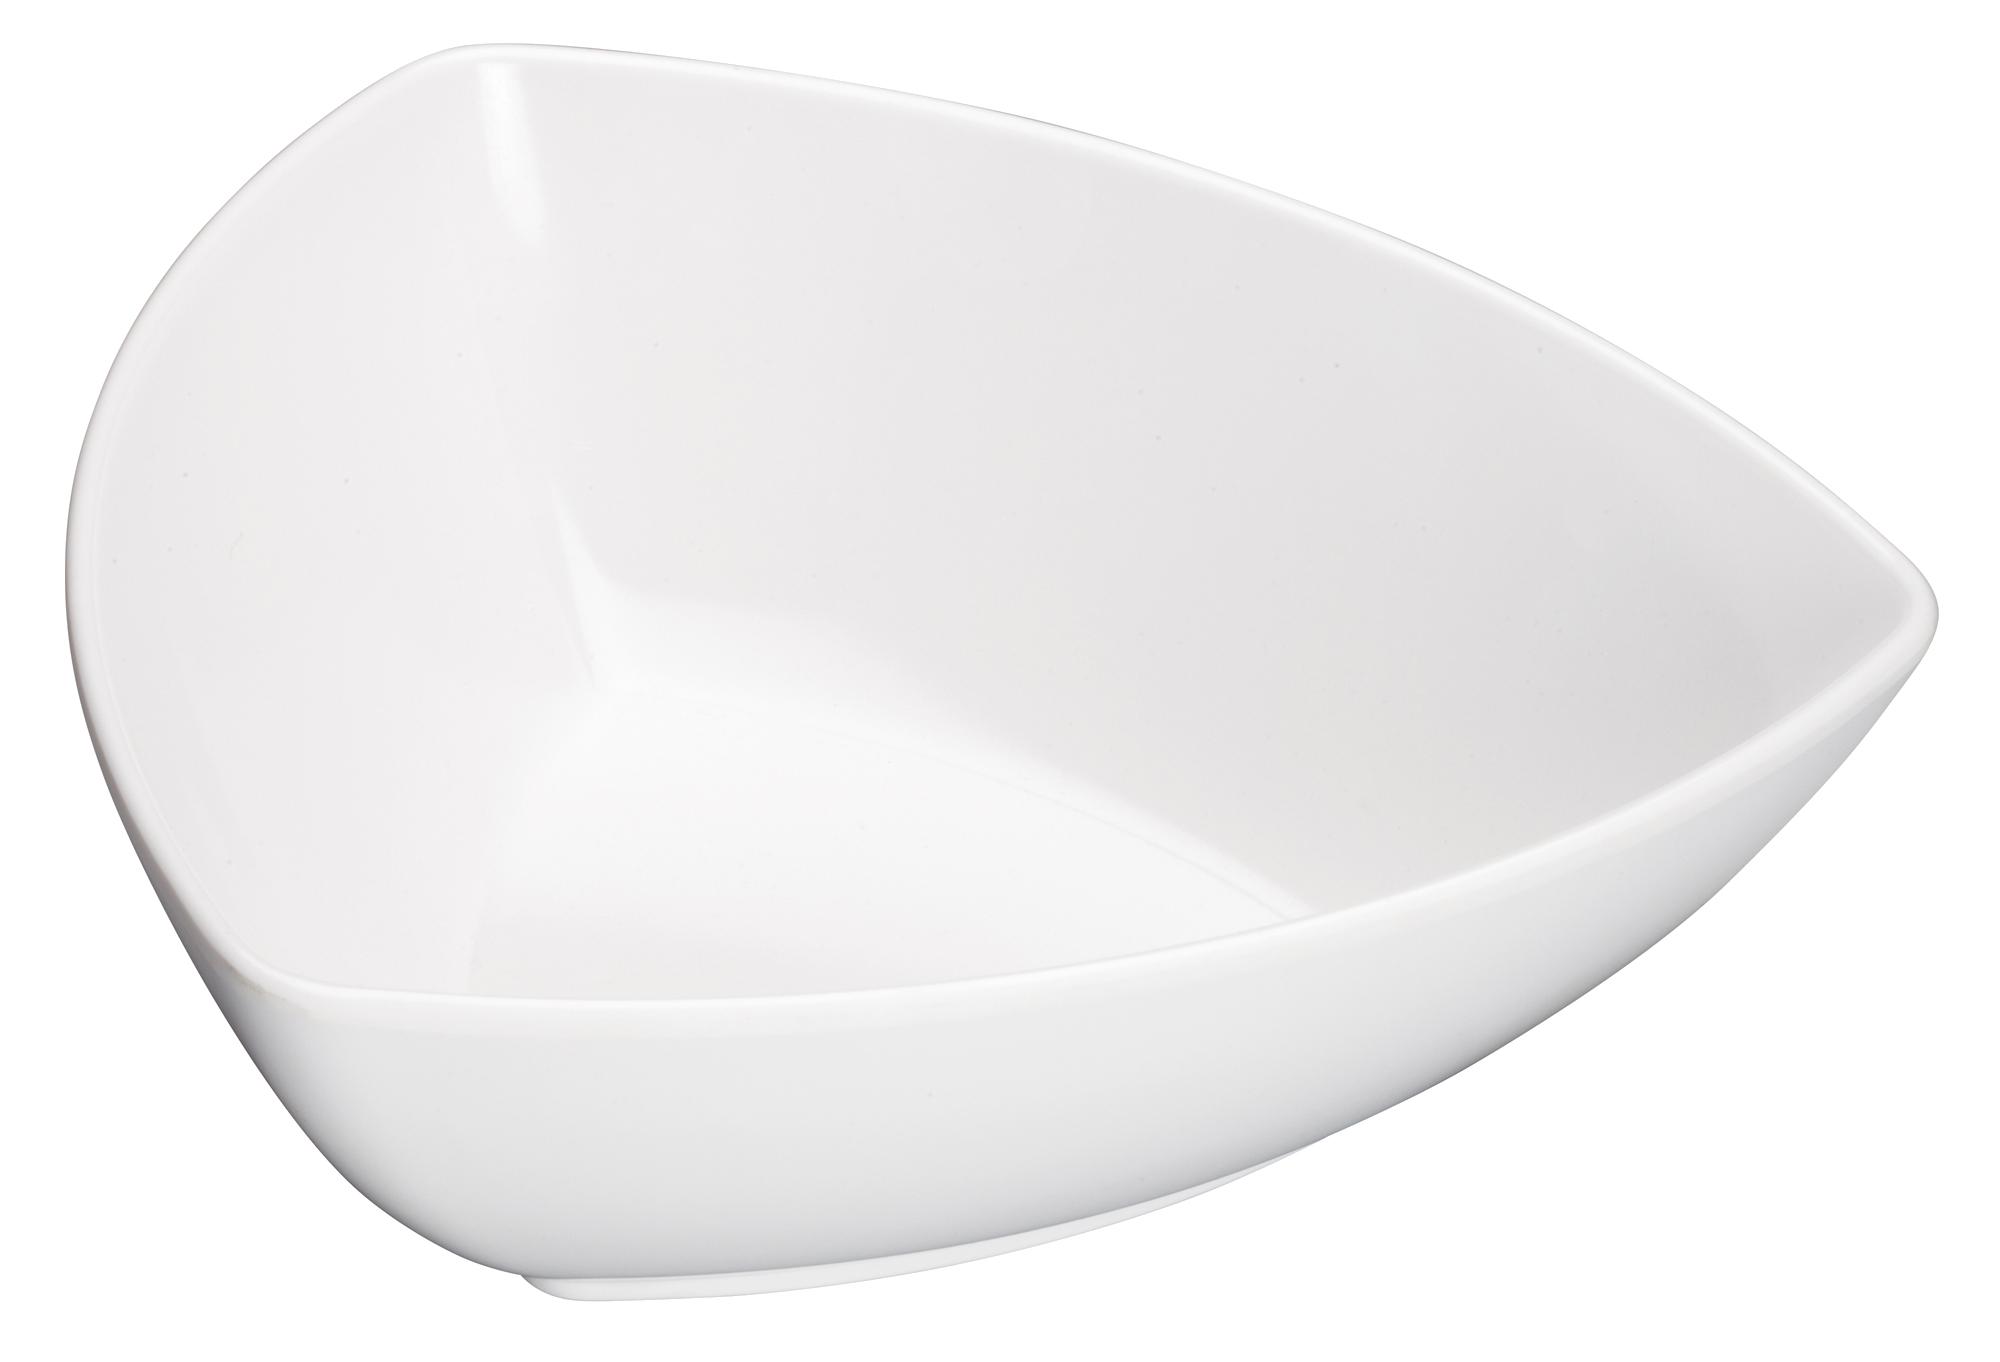 Winco WDM005-203 bowl, plastic,  1 - 2 qt (32 - 95 oz)